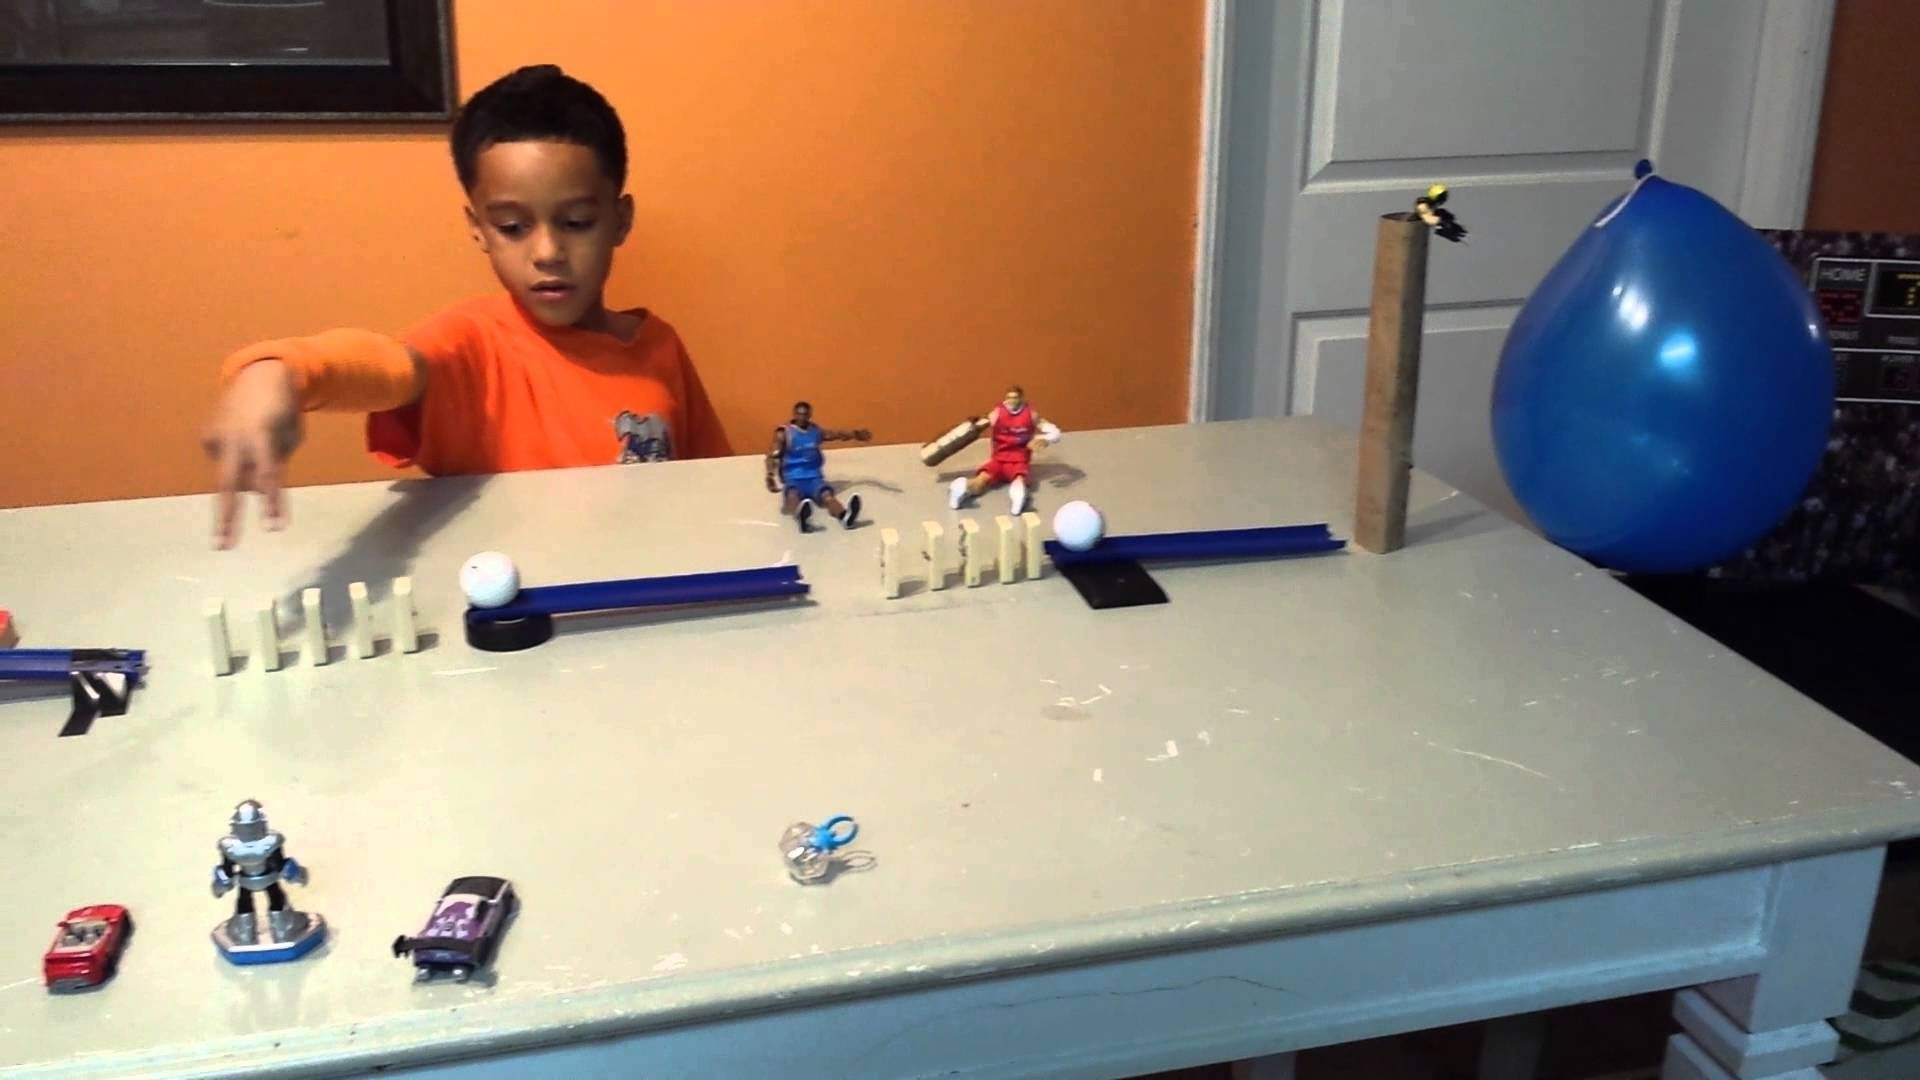 10 Fabulous Rube Goldberg Machine Ideas 10 Steps rube goldberg machine pop a balloon youtube 4 2020